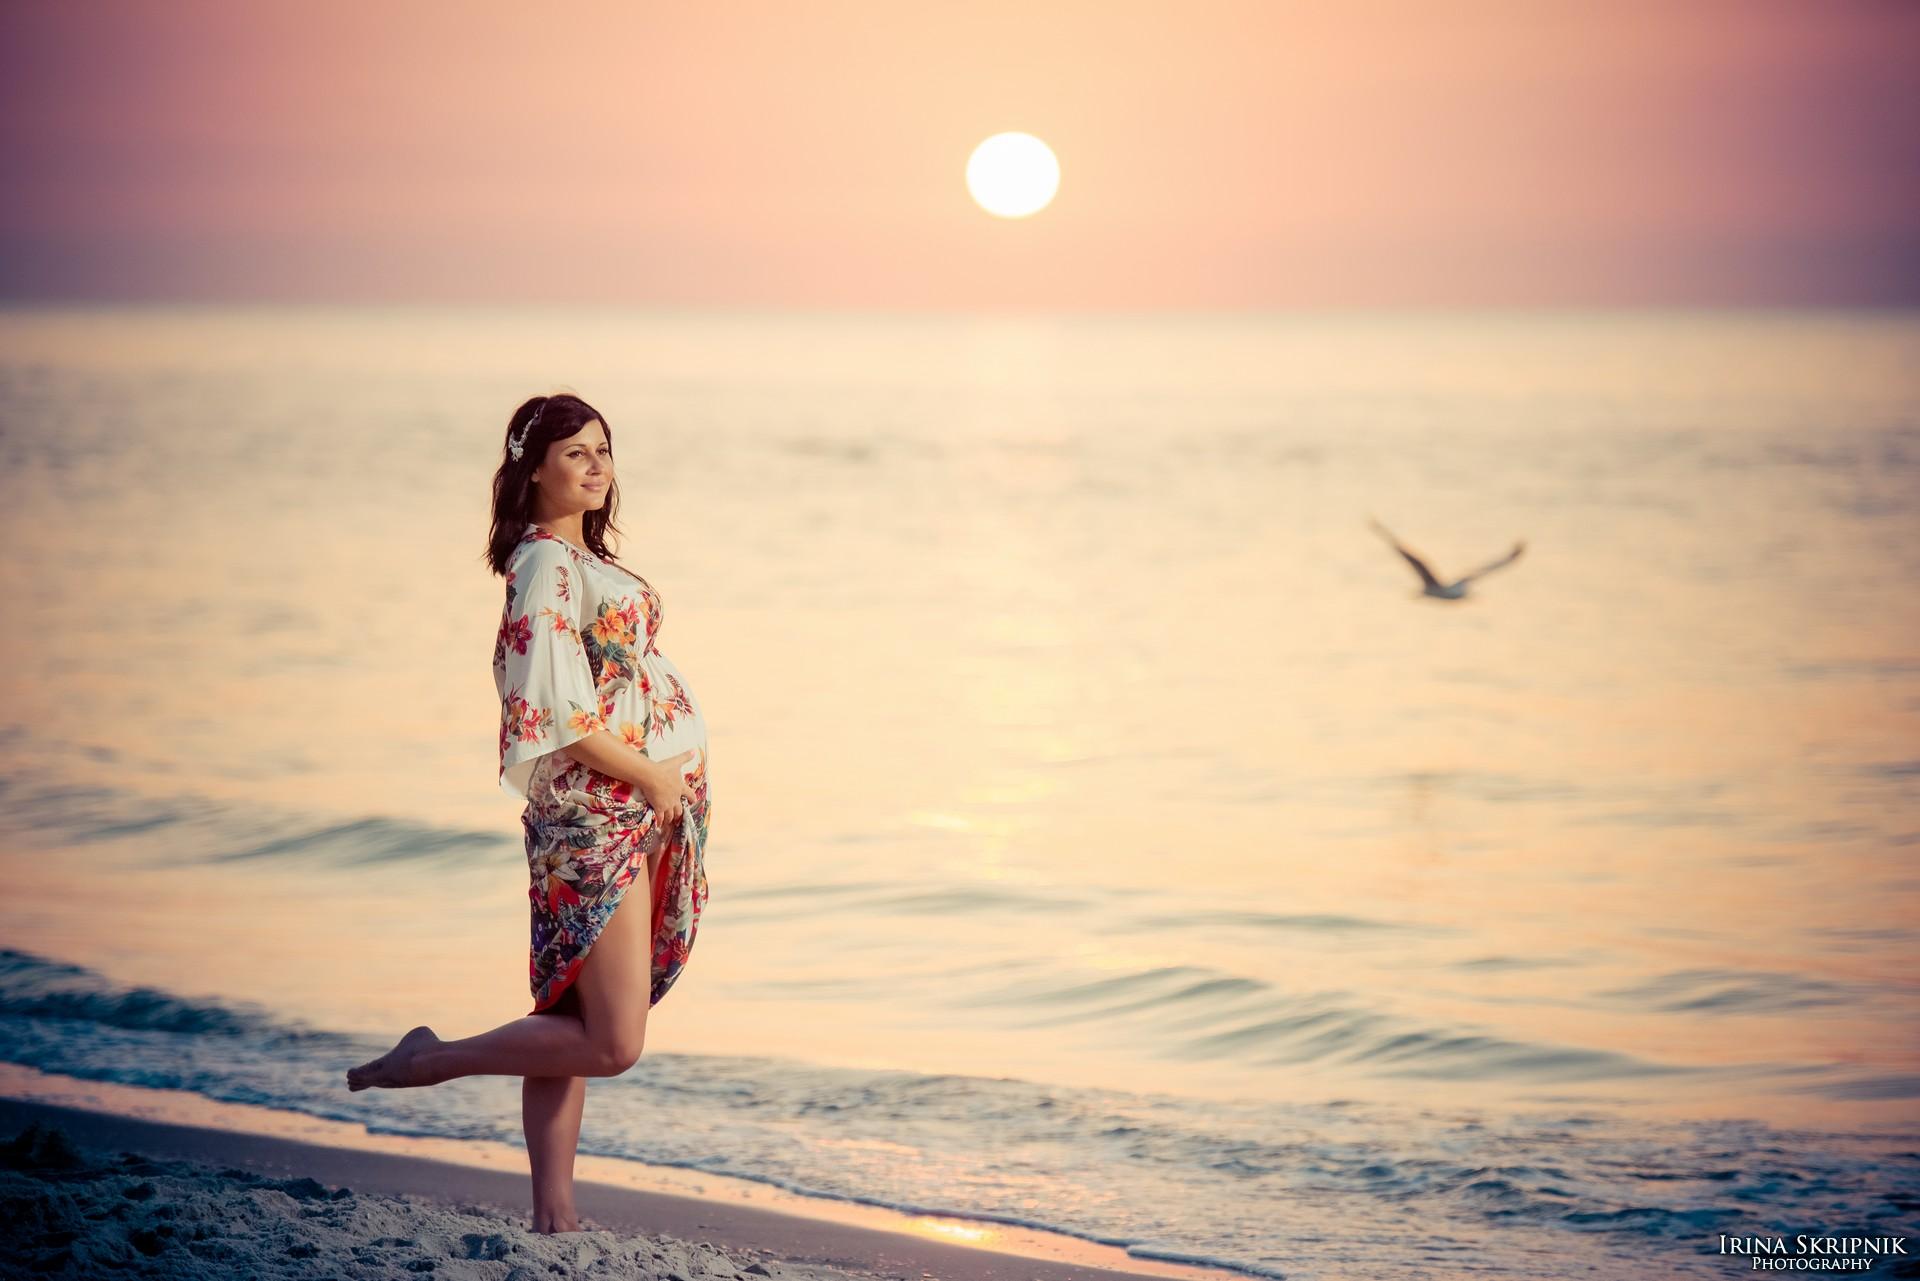 Irina Skripnik Photography 10082